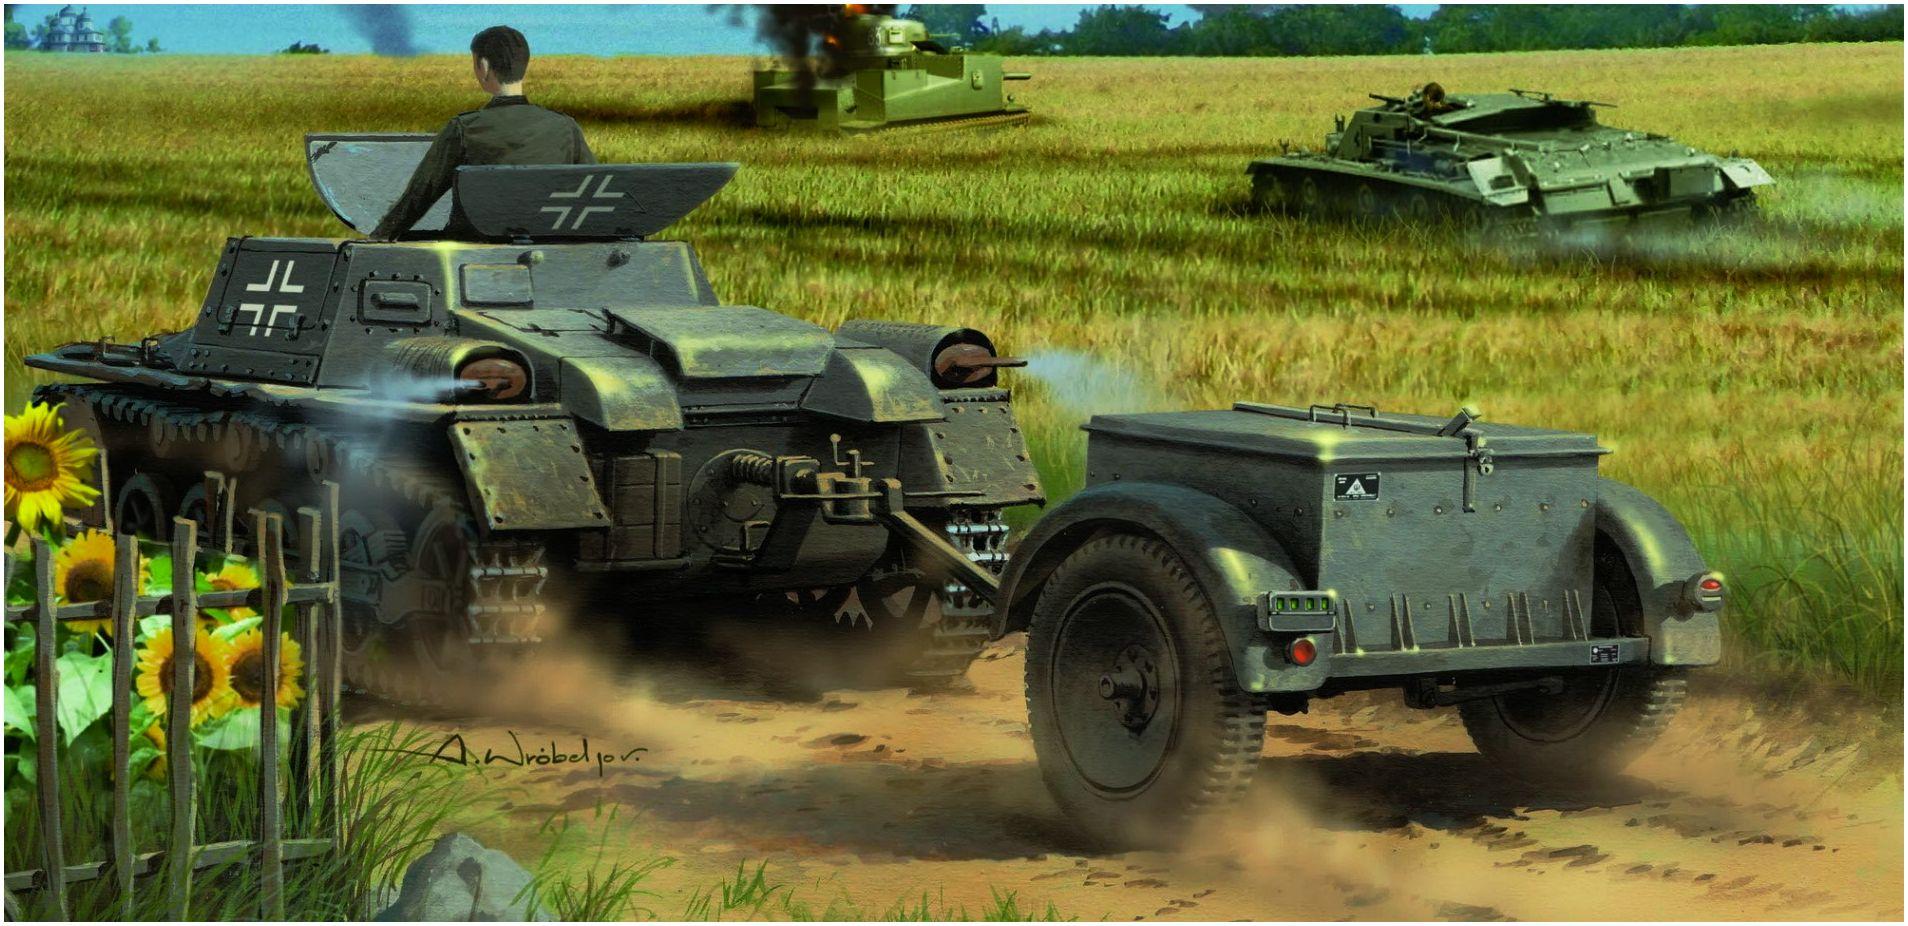 Wróbel Arkadiusz. Танк Panzerkampfwagen I Ausf. A .